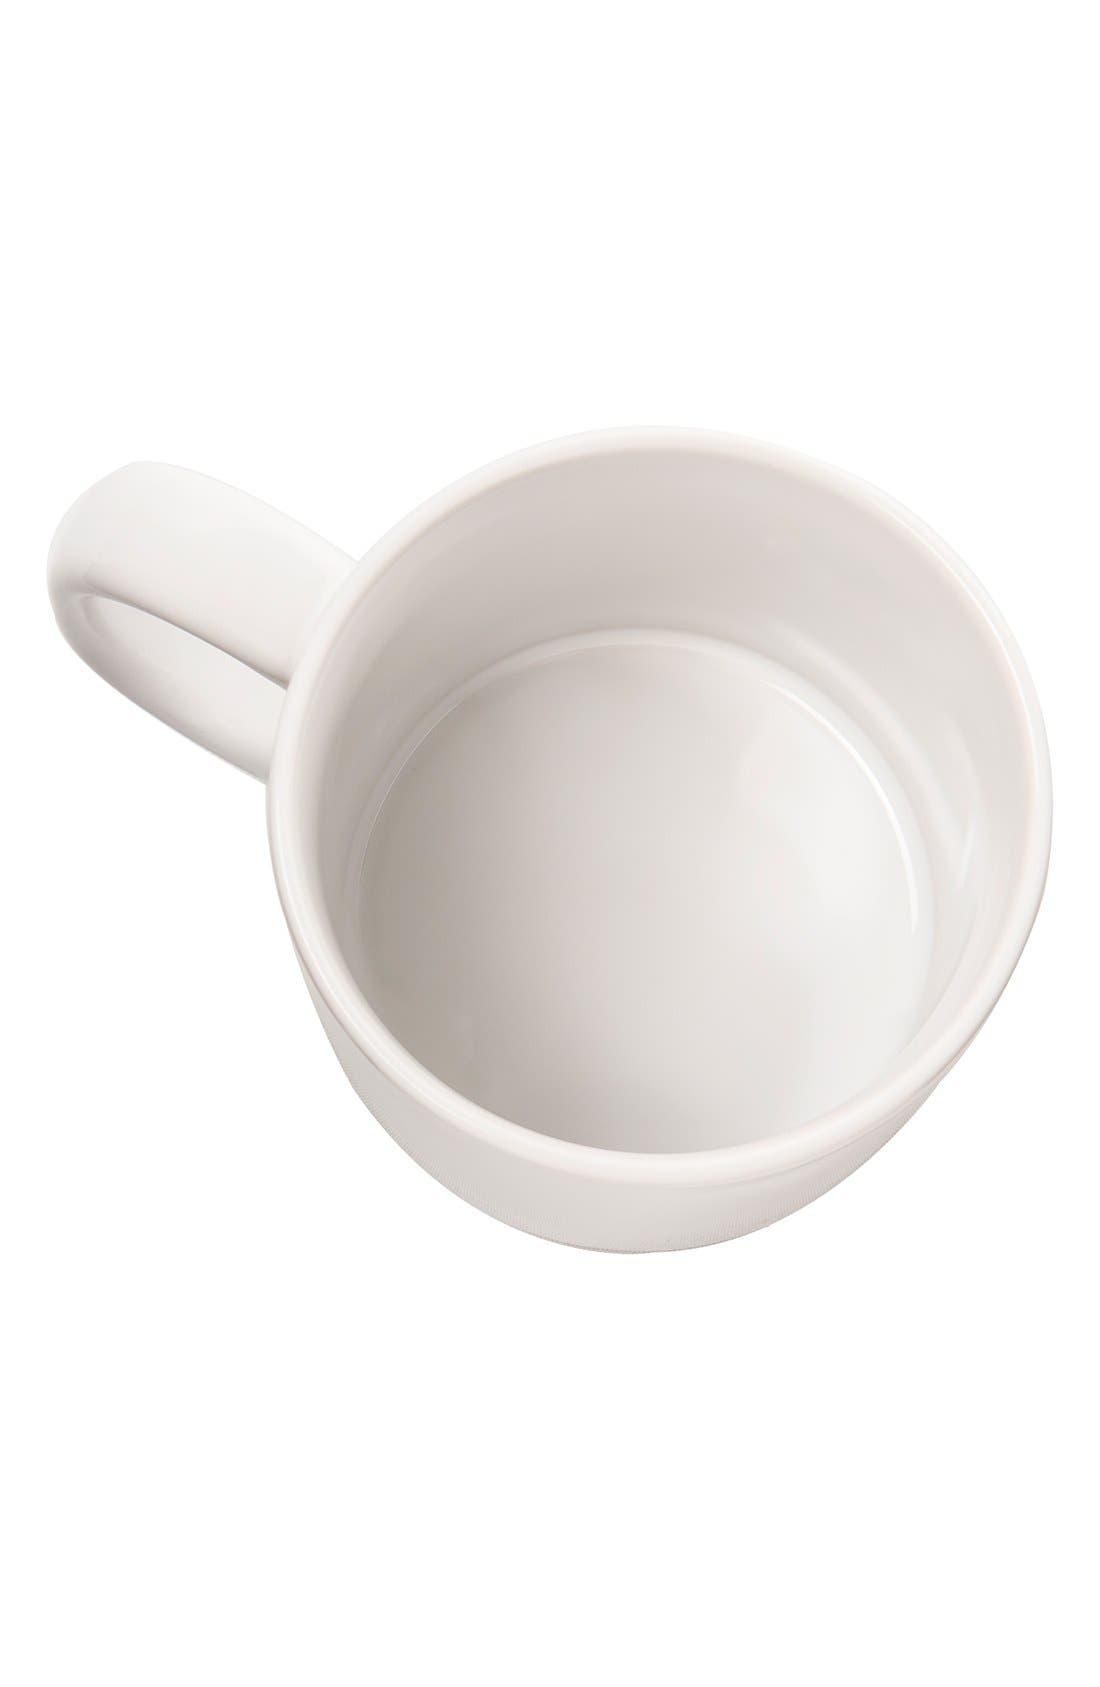 'Mom & Dad' Coffee Mugs,                             Alternate thumbnail 4, color,